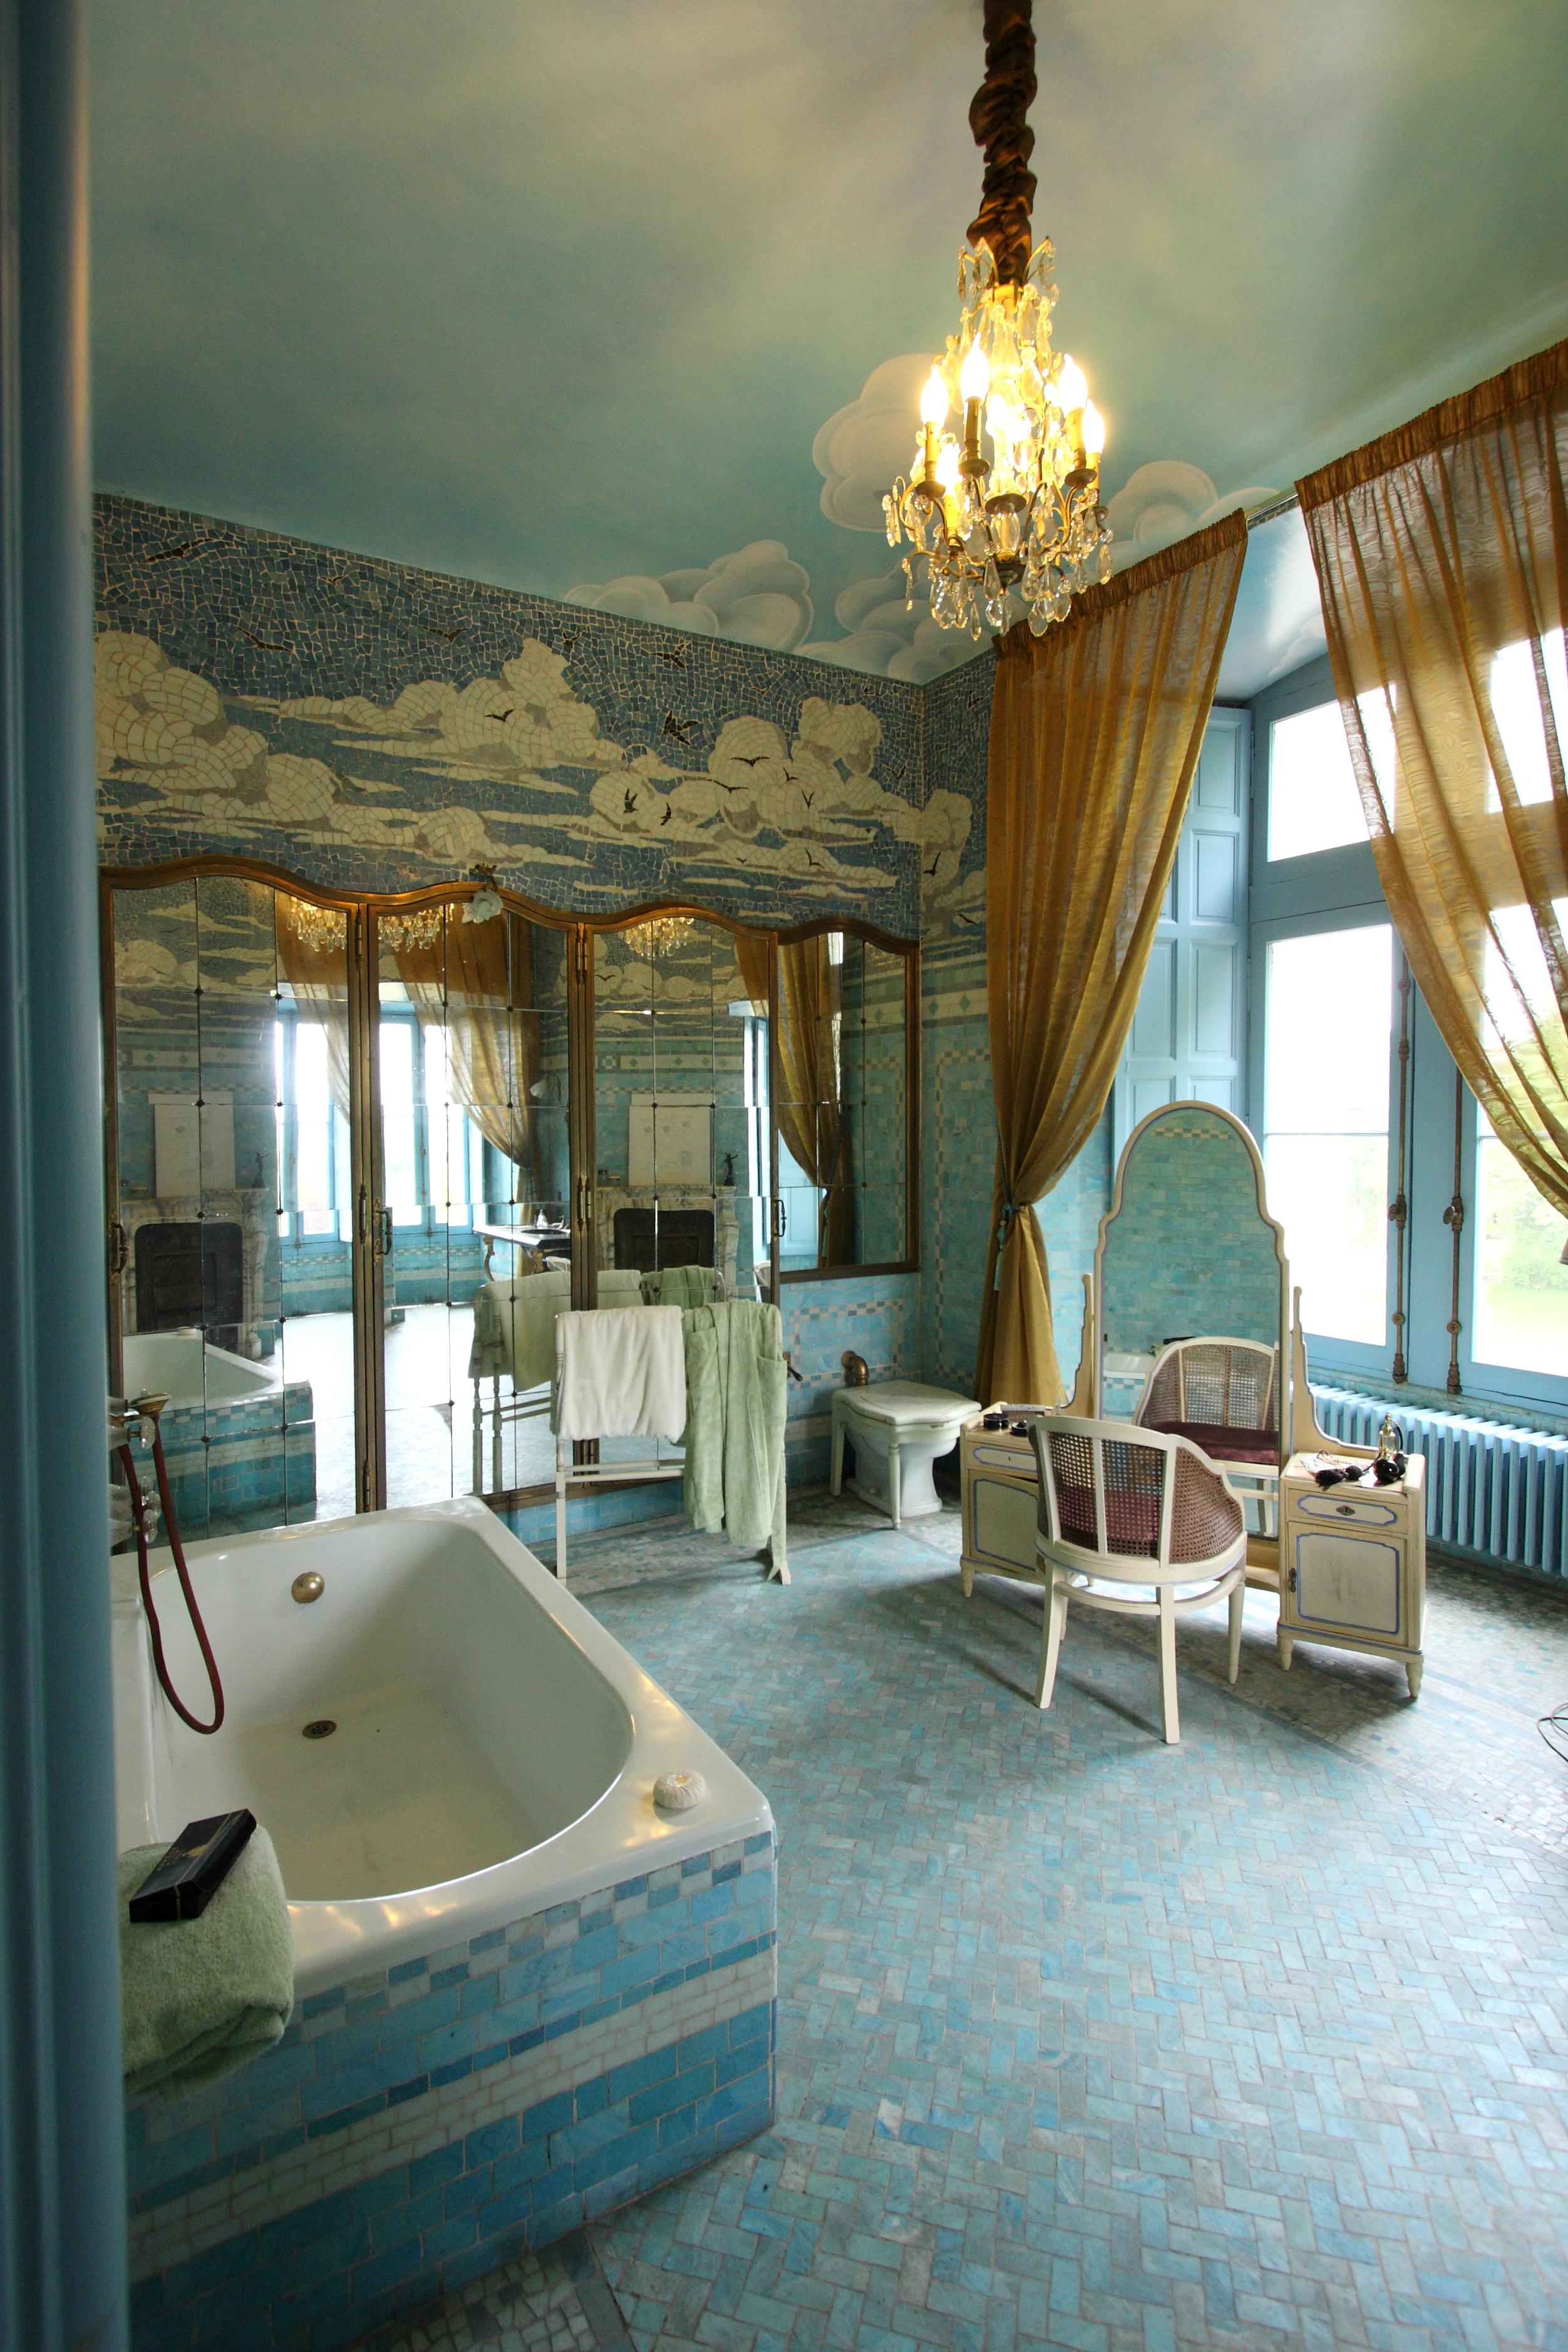 file ch teau de cand salle de bain jpg wikimedia commons. Black Bedroom Furniture Sets. Home Design Ideas